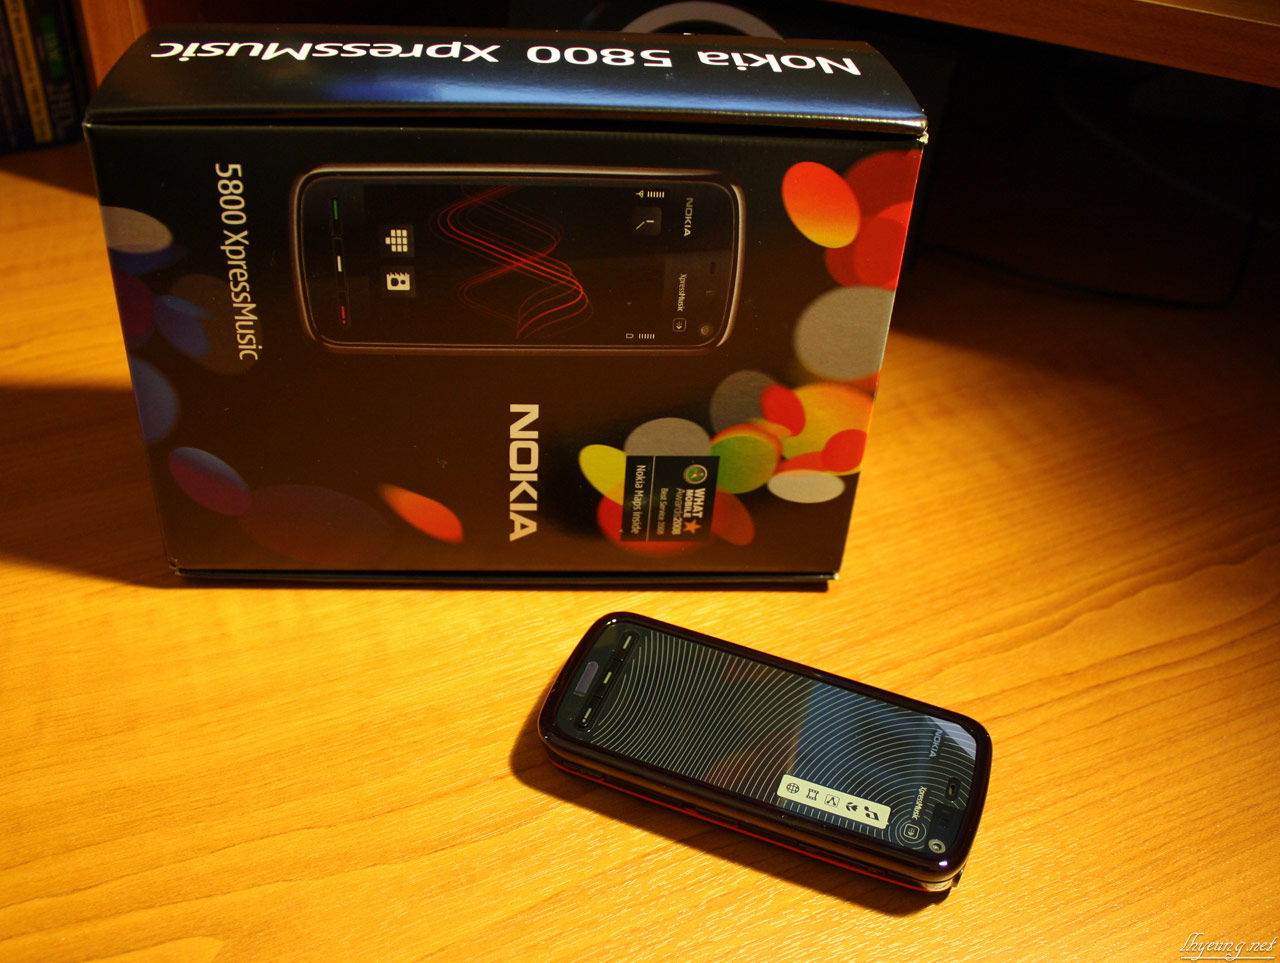 Nokia 5800 Gps Navigation